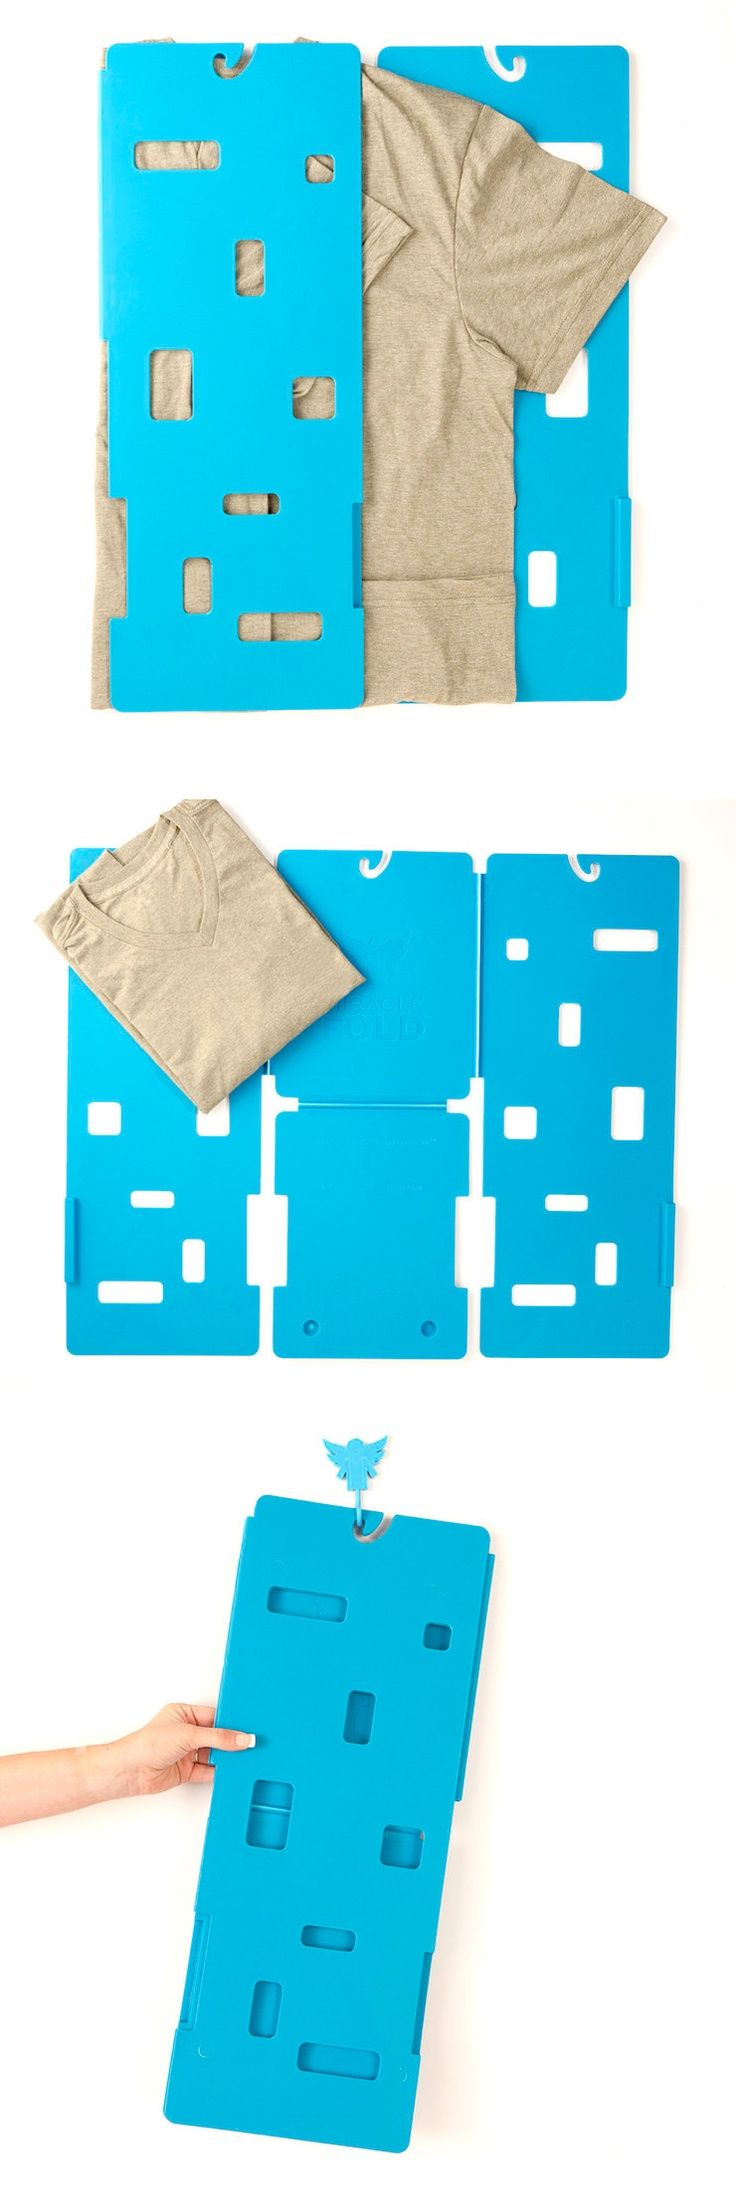 Easy Laundry Folder: A useful gift for organized people! www.MyWonderList.com